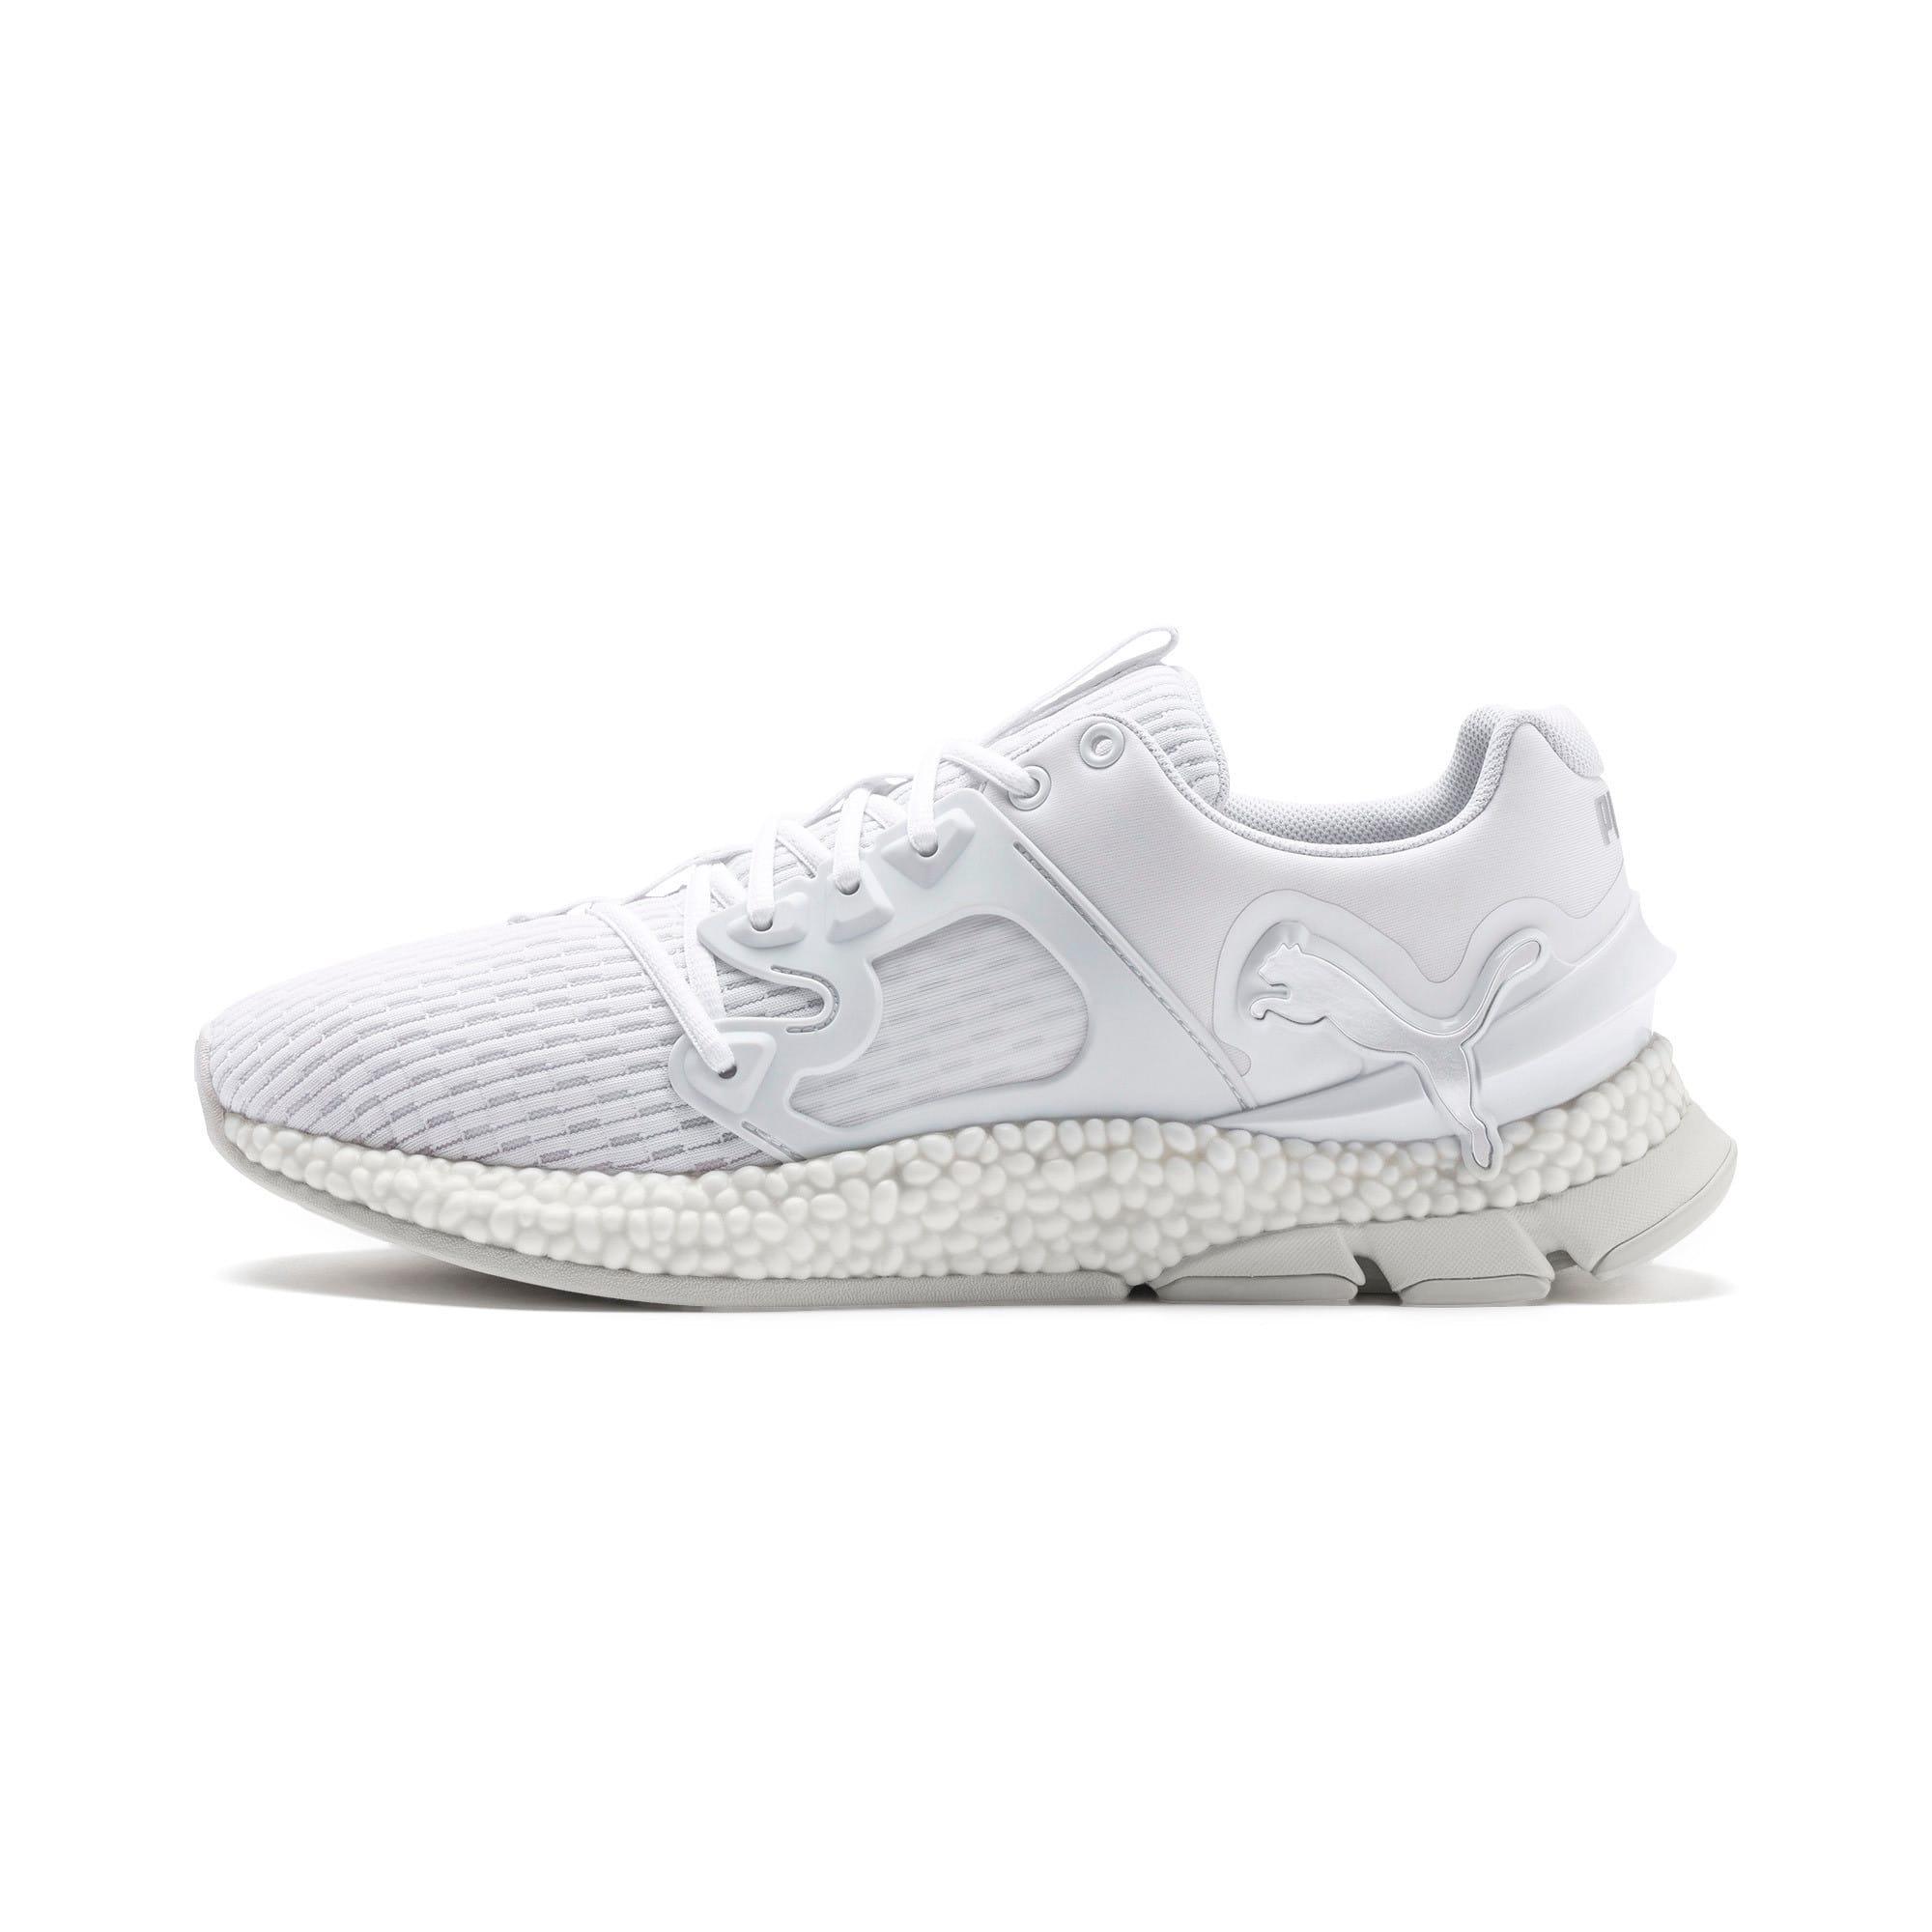 Thumbnail 1 of HYBRID Sky Lights Men's Running Shoes, Puma White-Puma Silver, medium